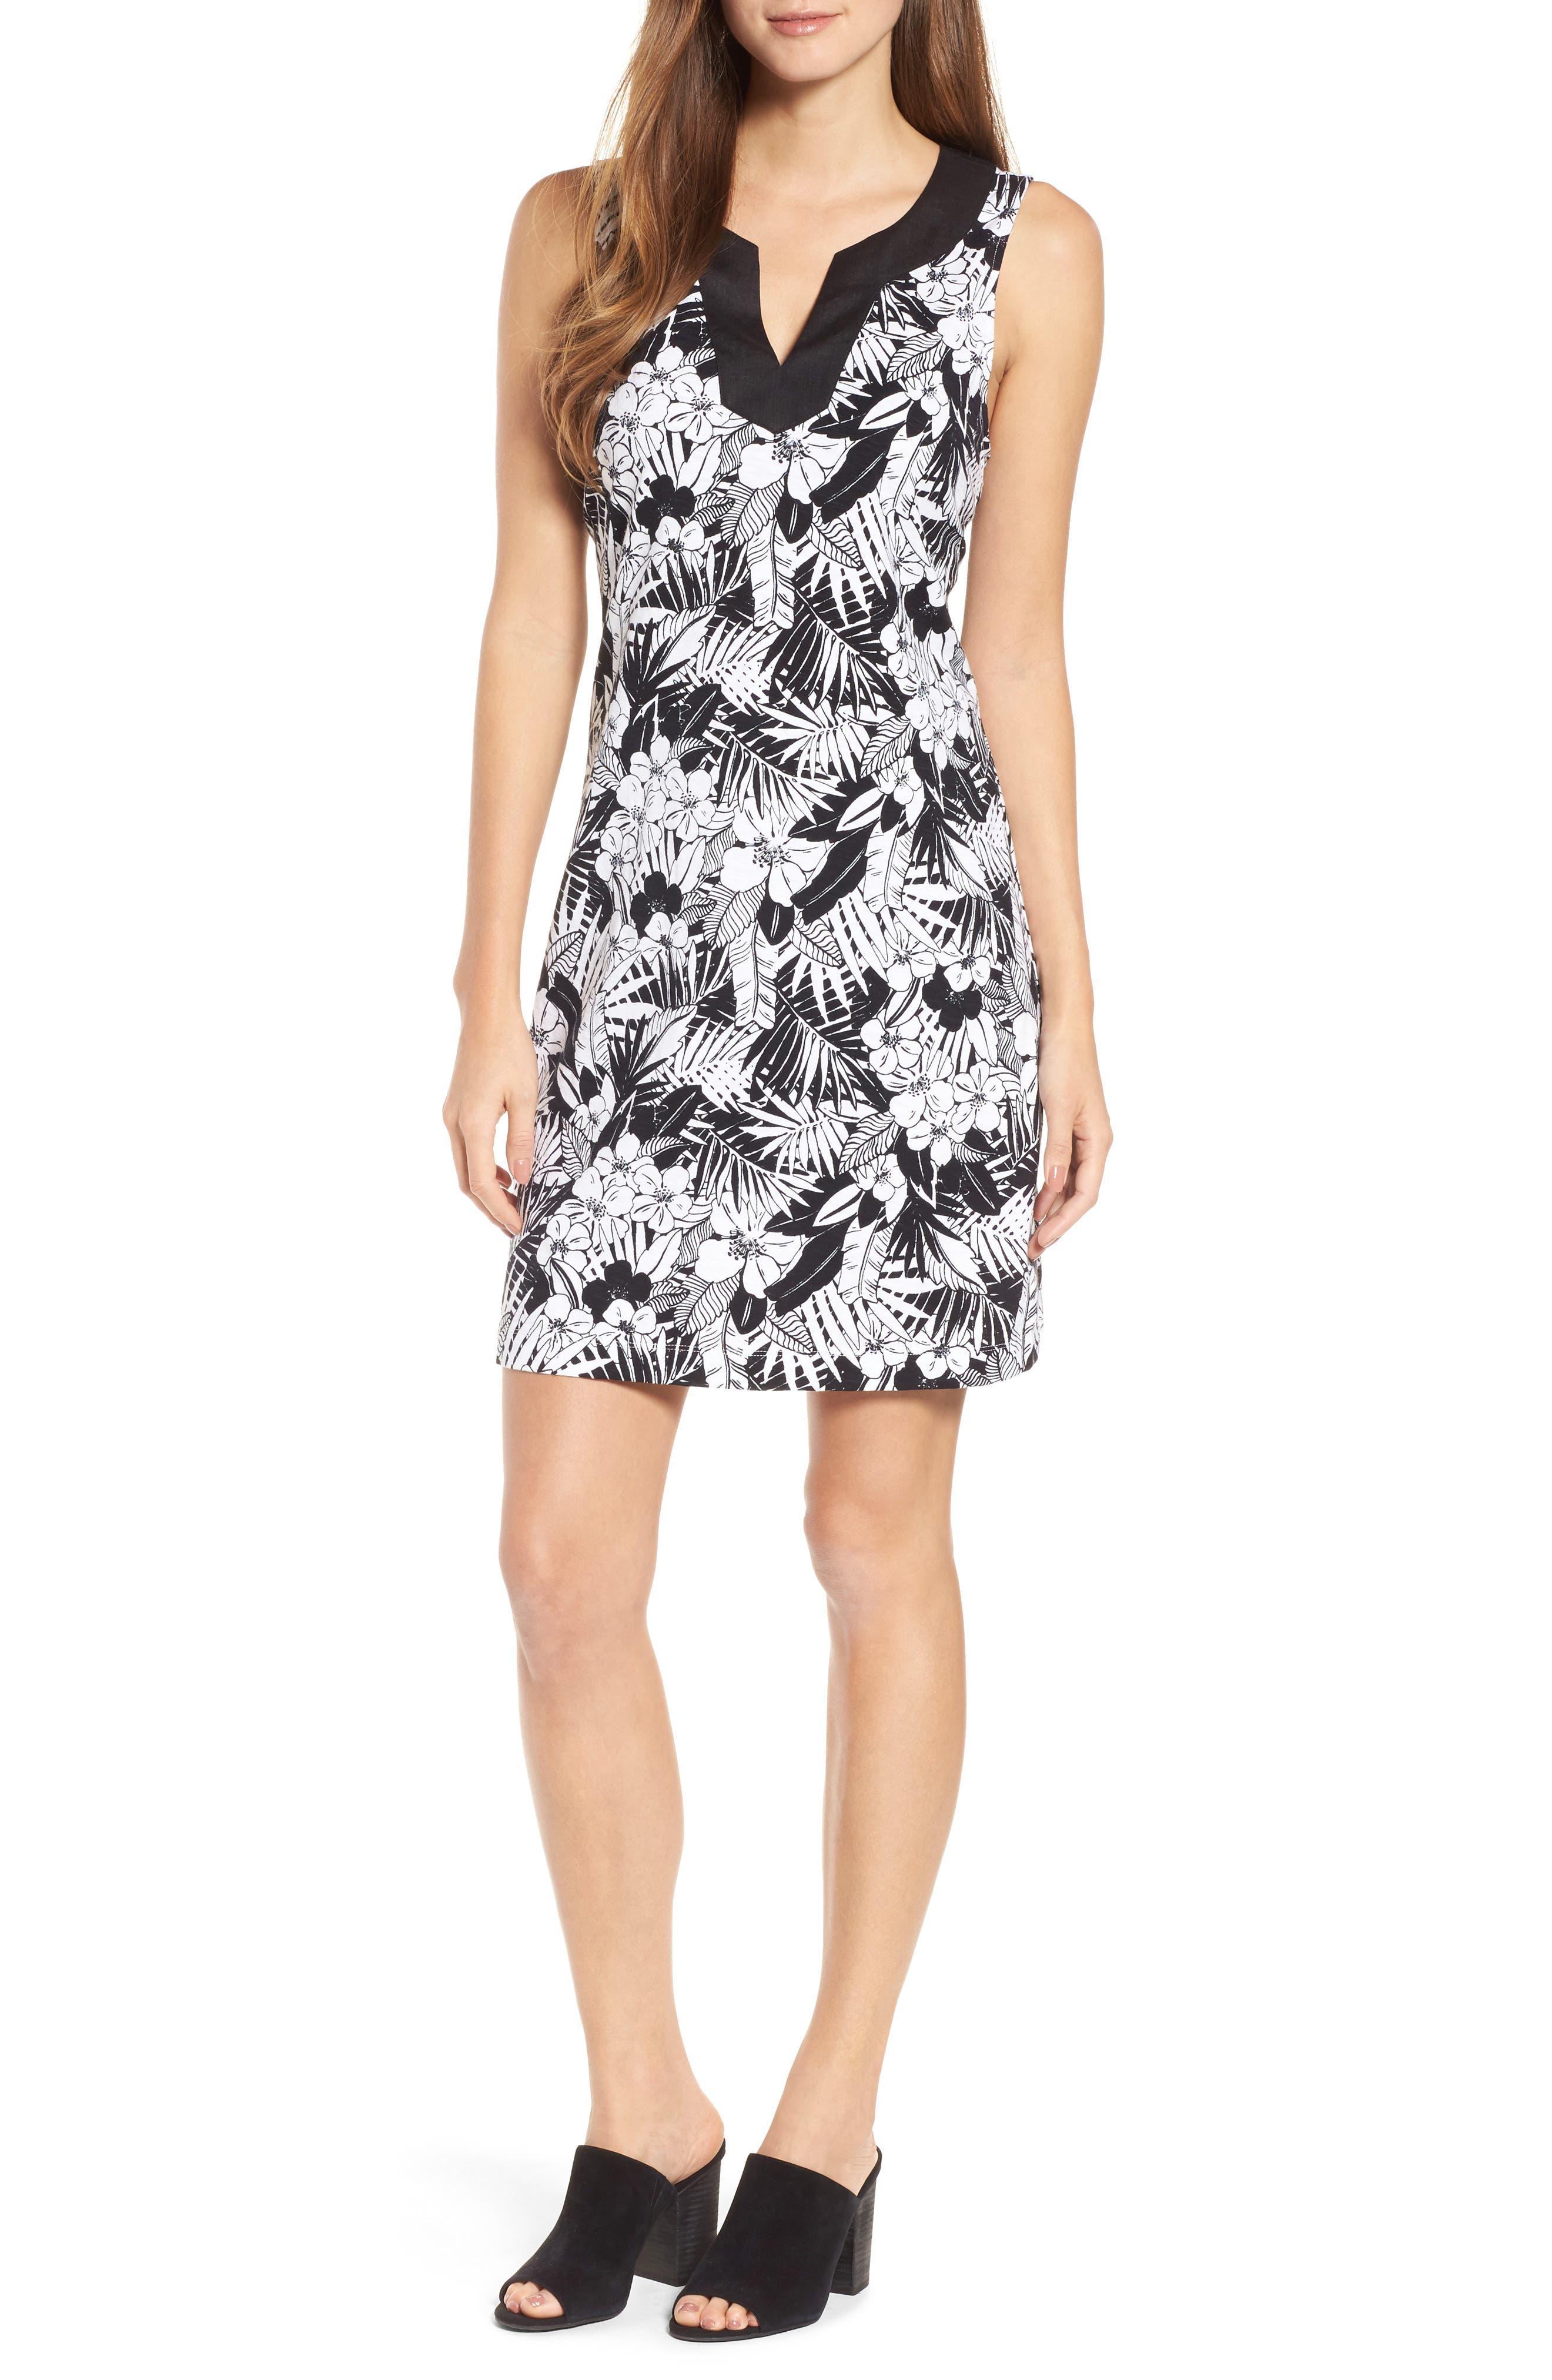 Alternate Image 1 Selected - Tommy Bahama Palm Noir Sleeveless Tunic Dress